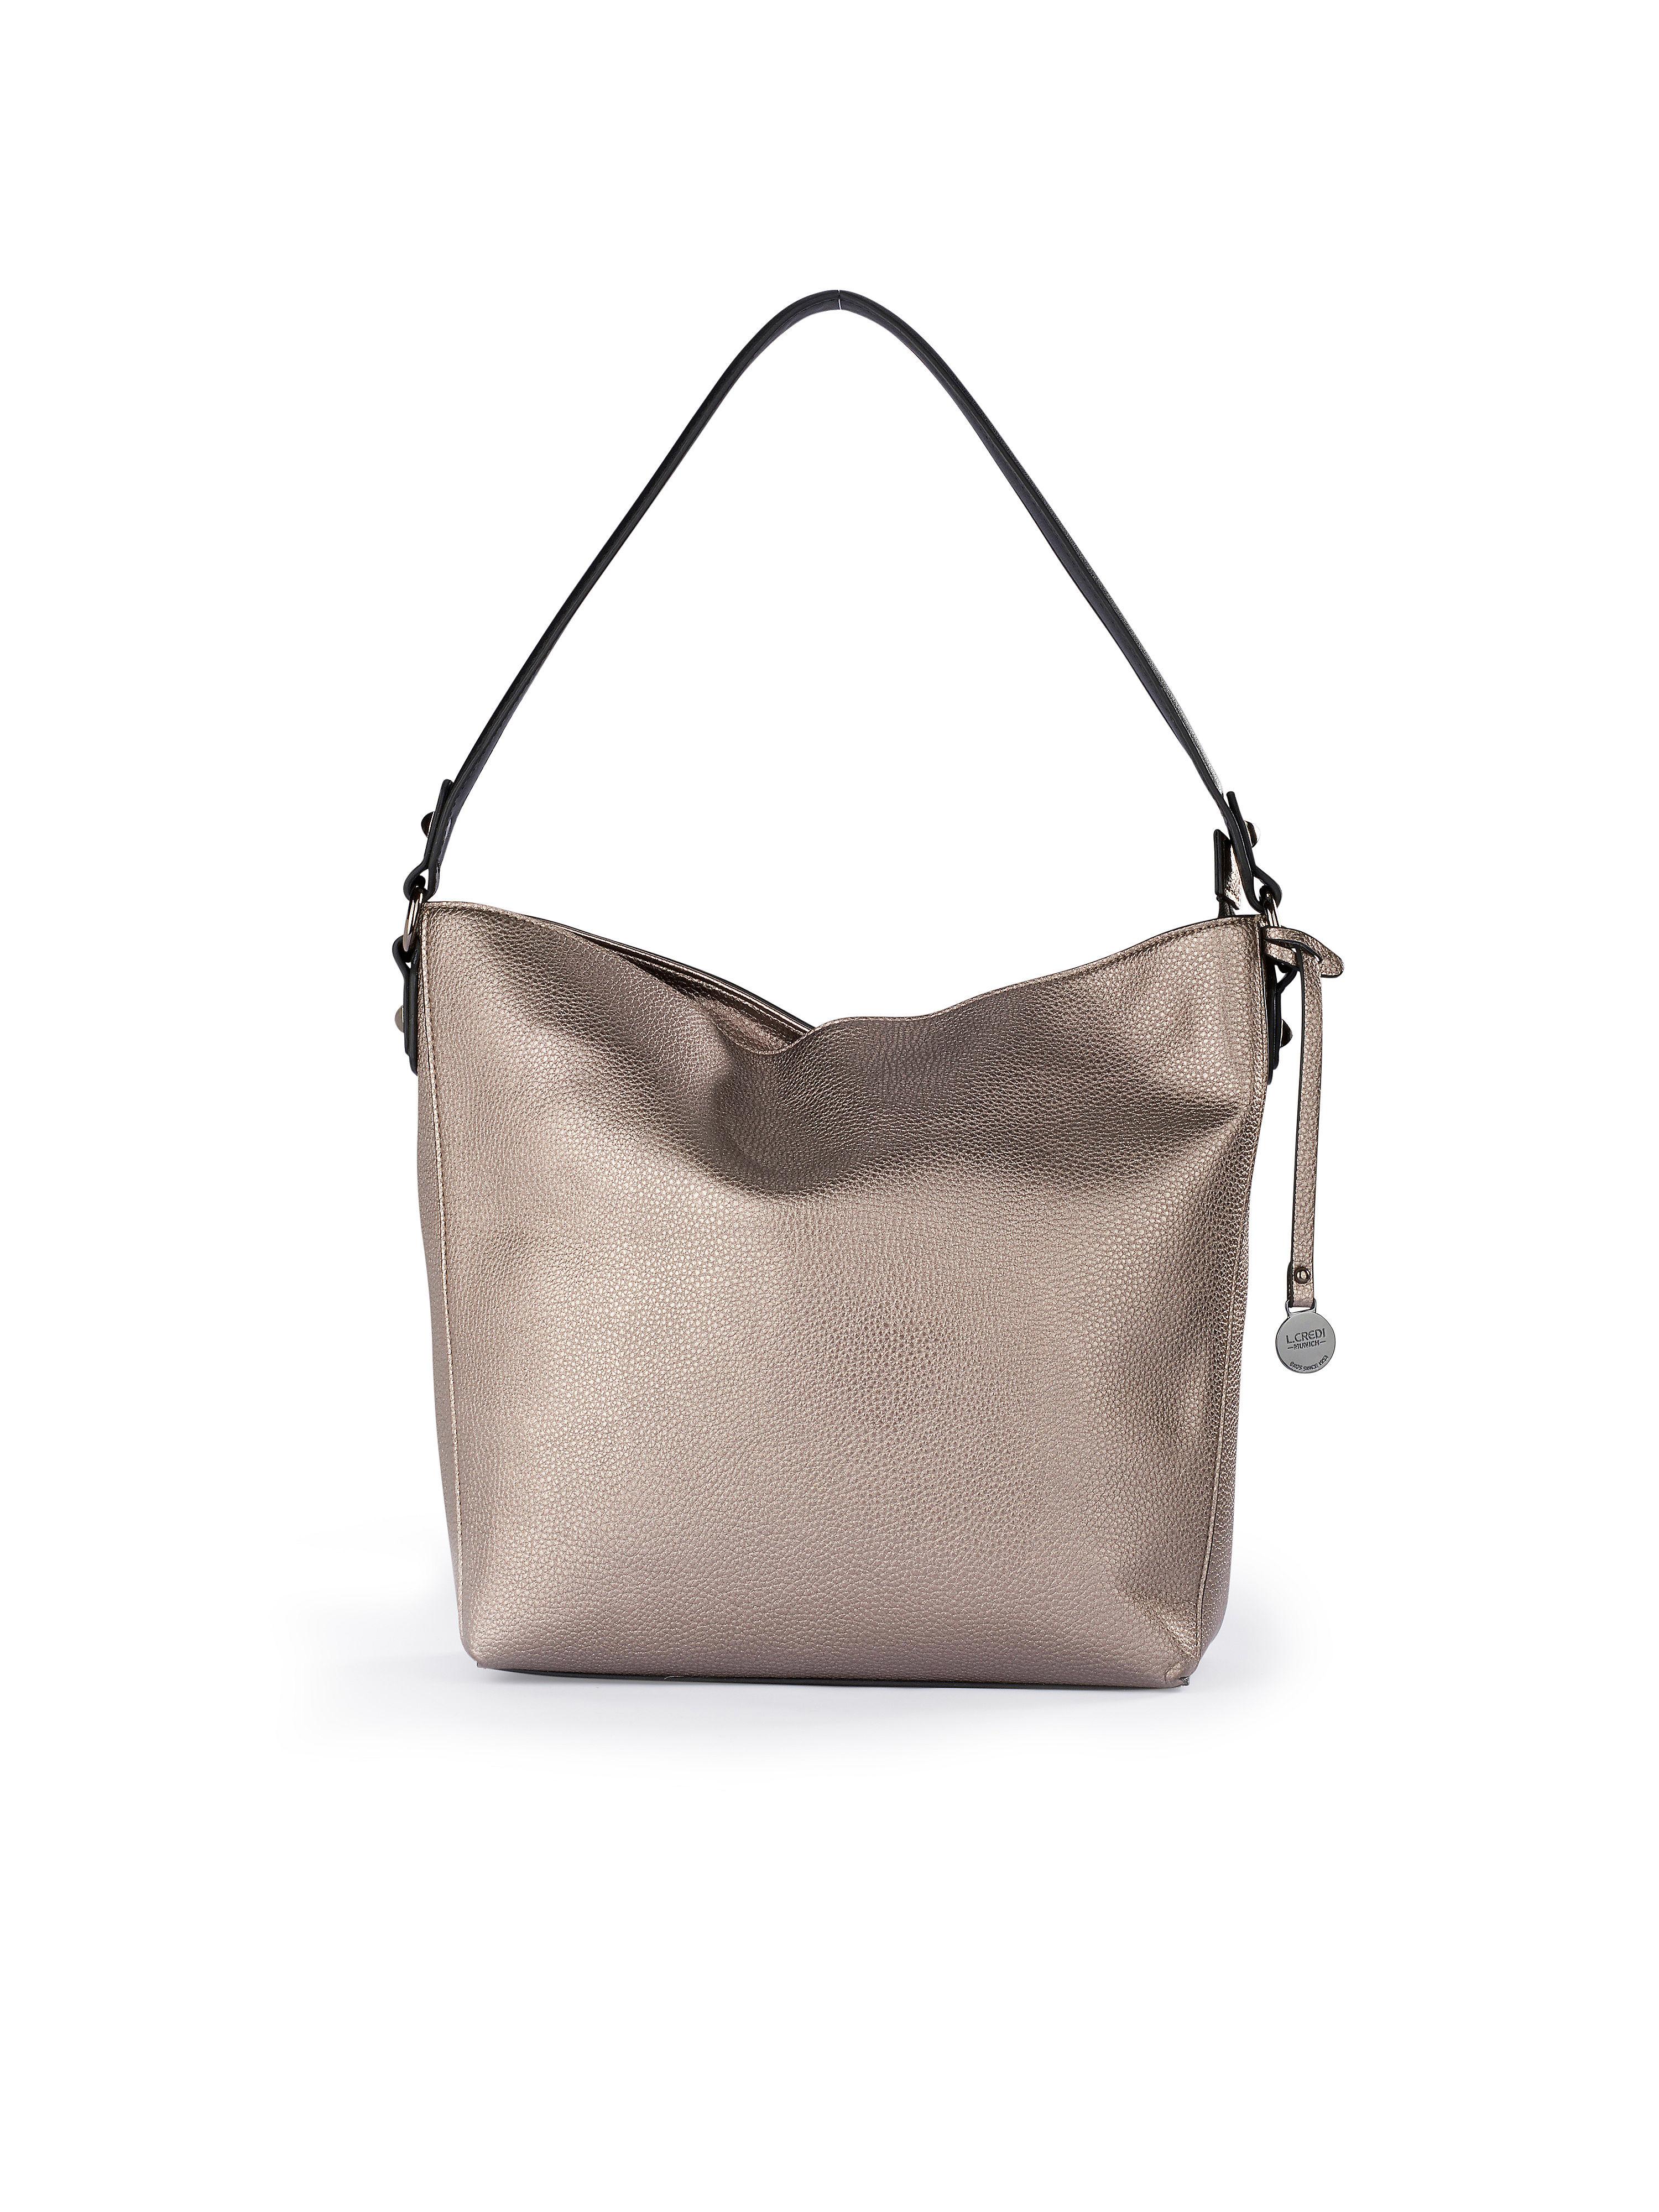 Image of   Shopper Fra L. Credi brun